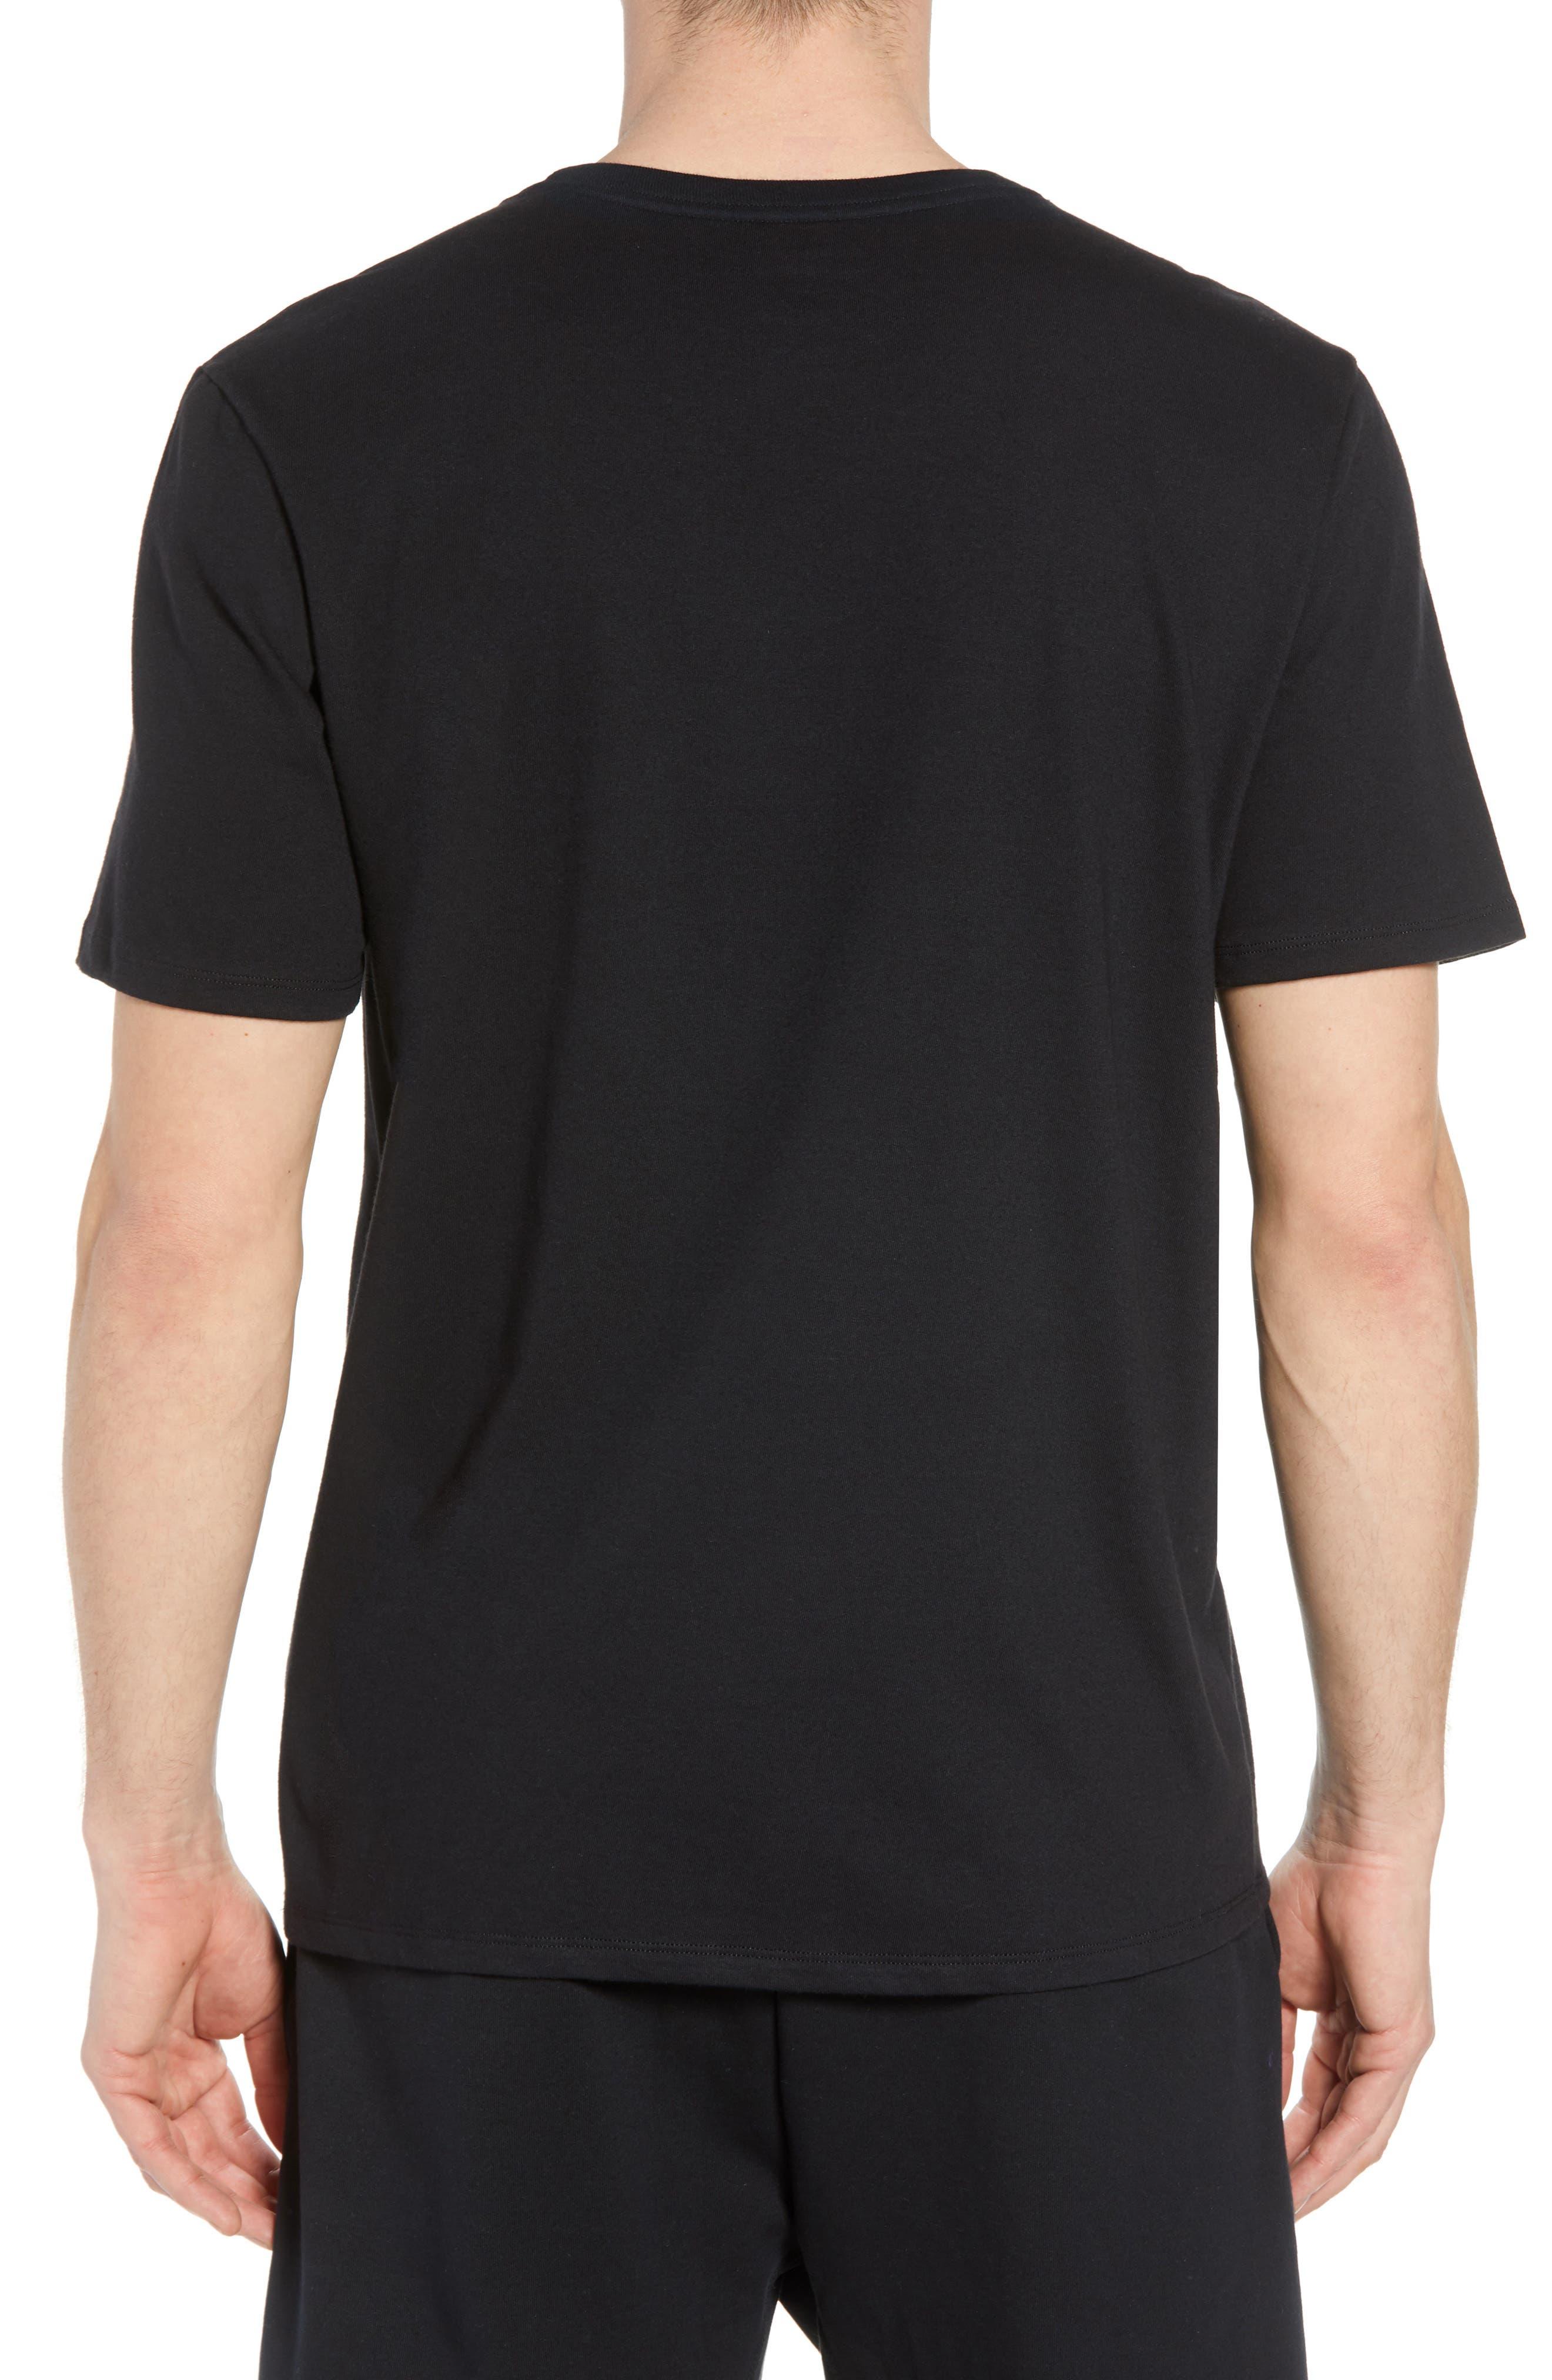 Dry Pointguard Graphic T-Shirt,                             Alternate thumbnail 2, color,                             BLACK/ BLACK